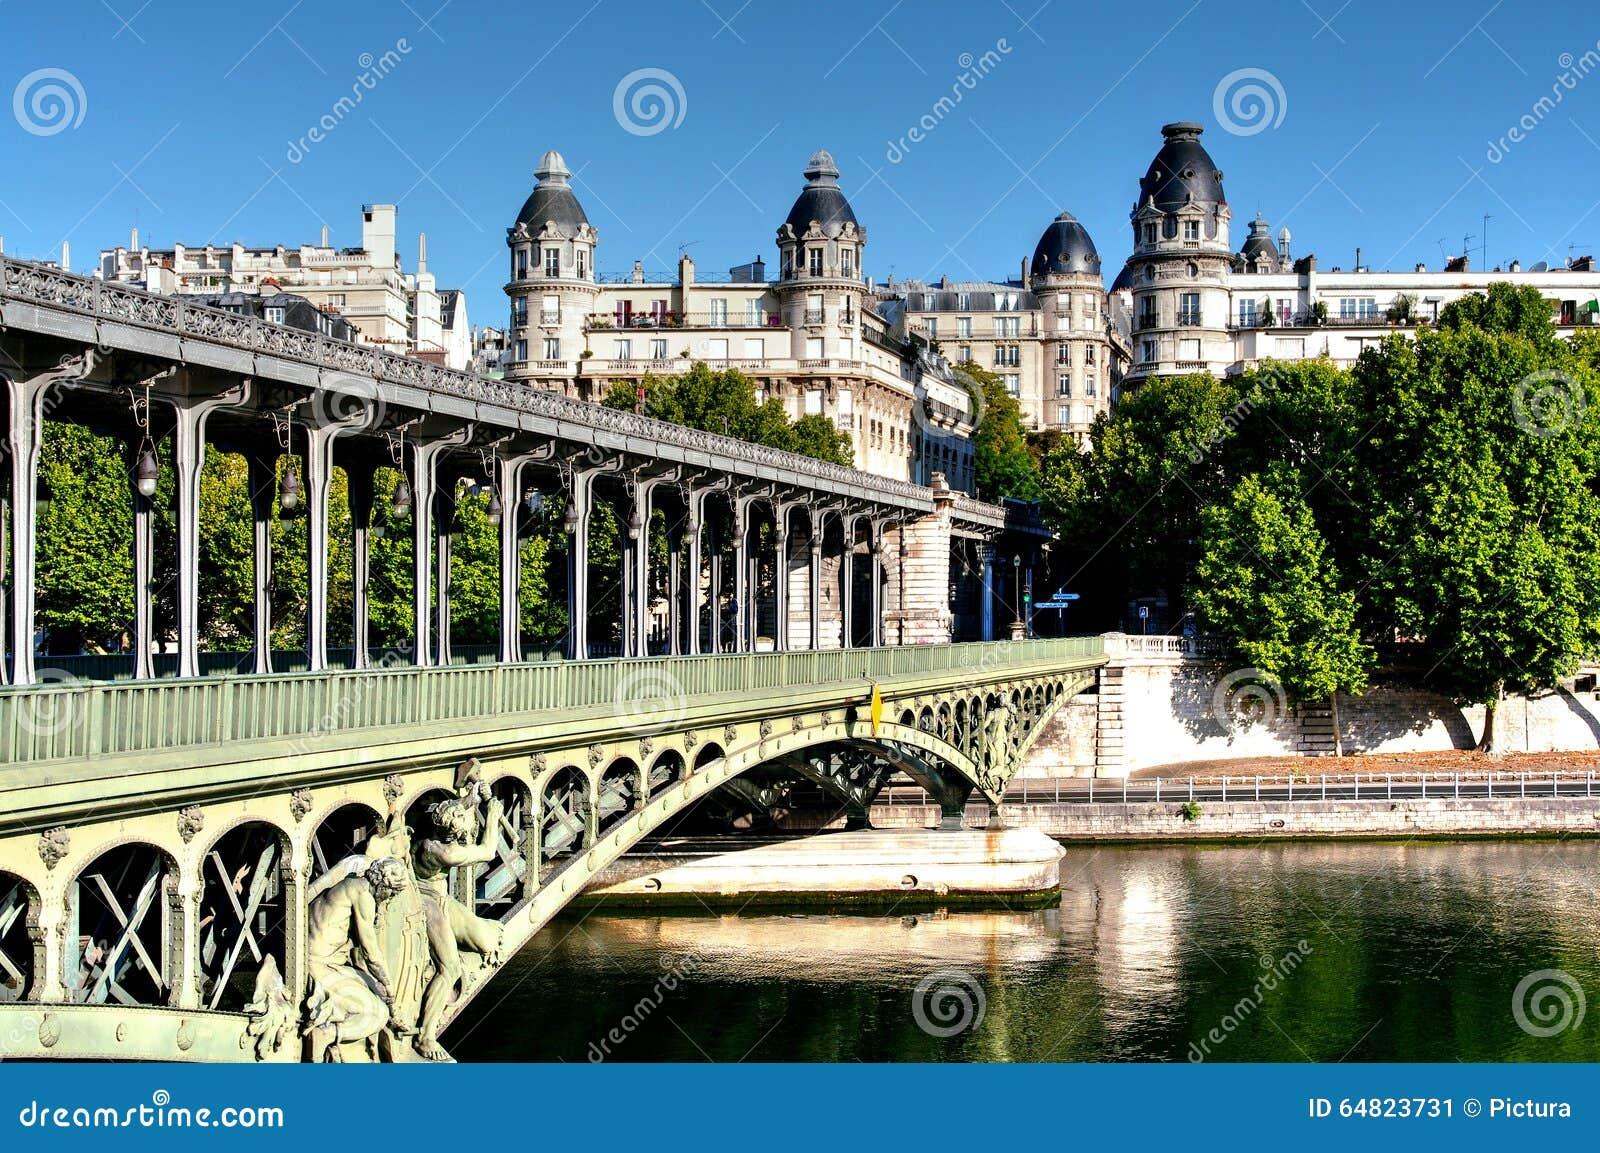 Pont De Bir Hakeim Paris France Stock Image Image Of